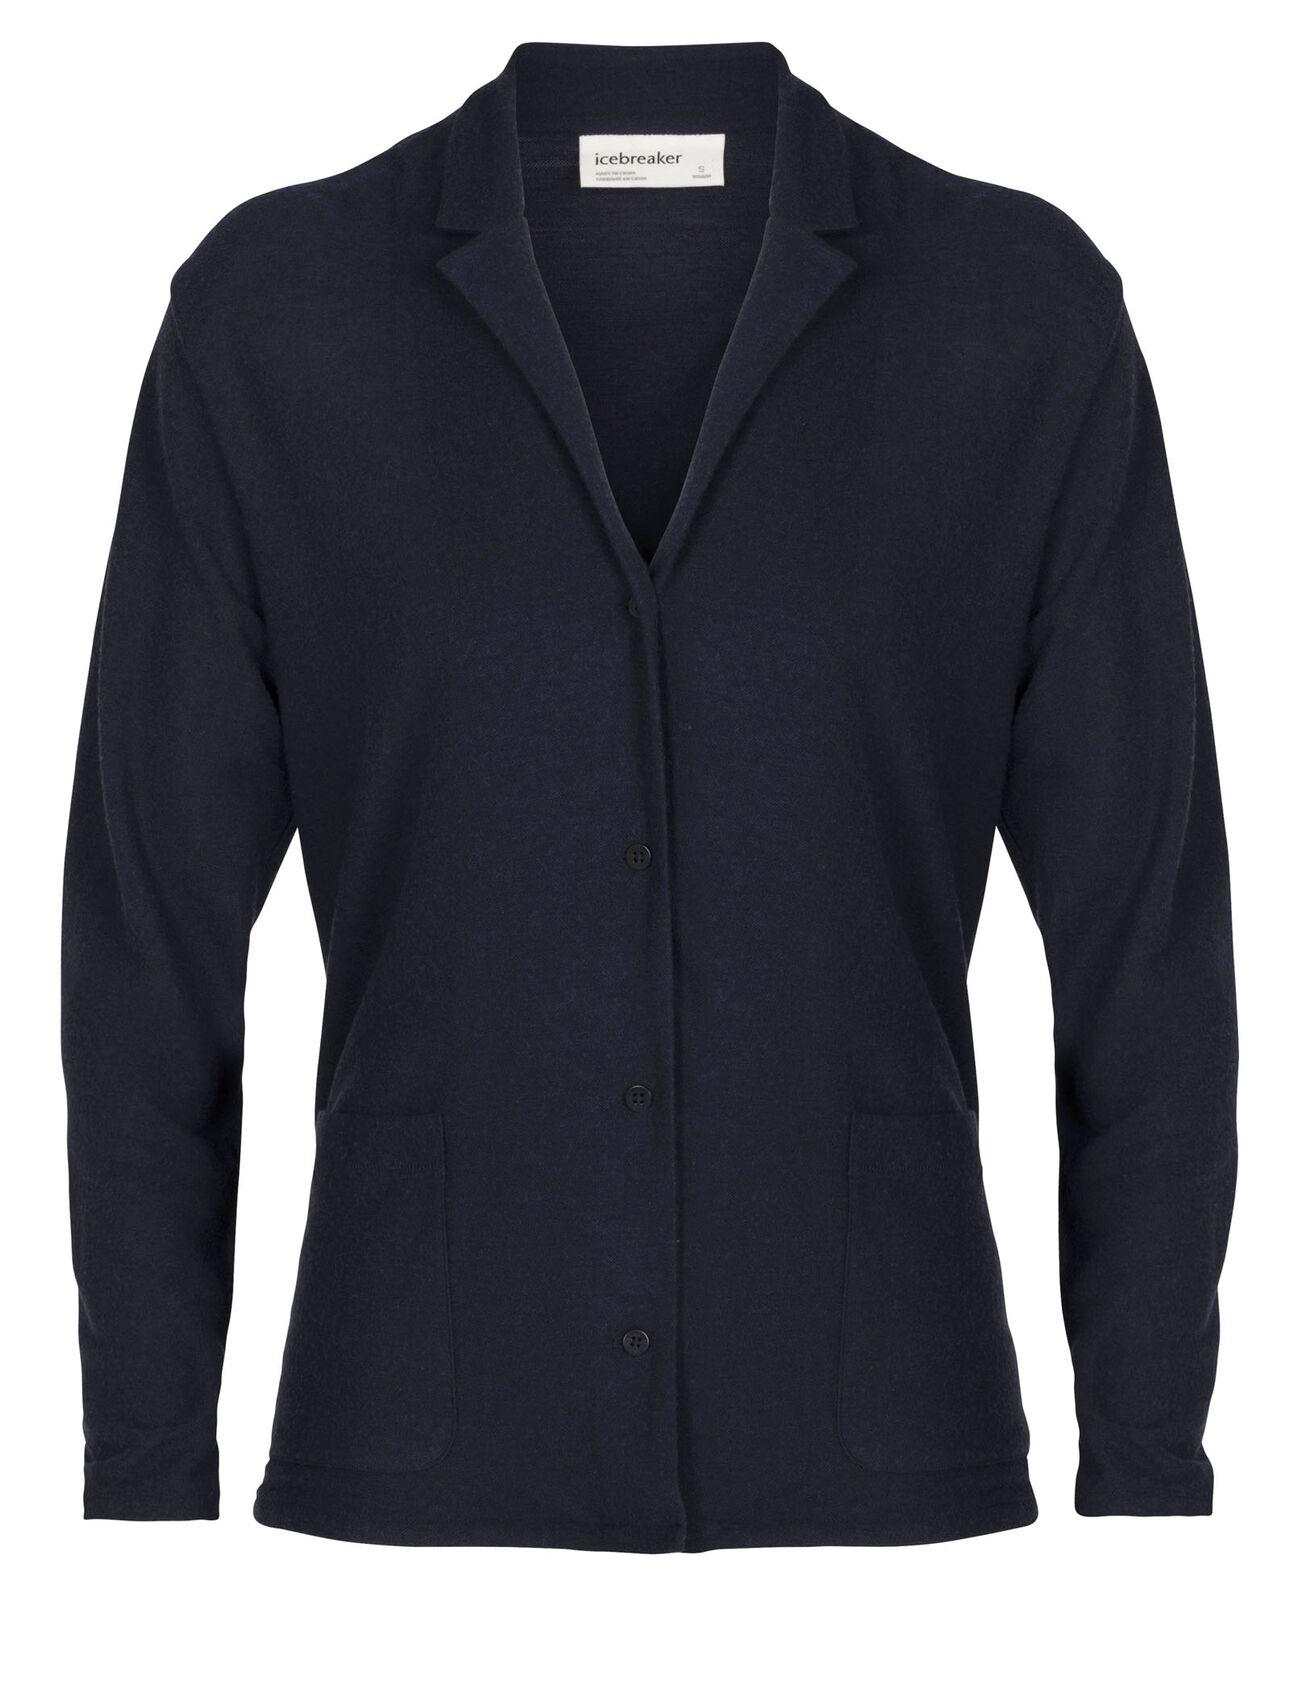 Merino 180 Pique Jacket